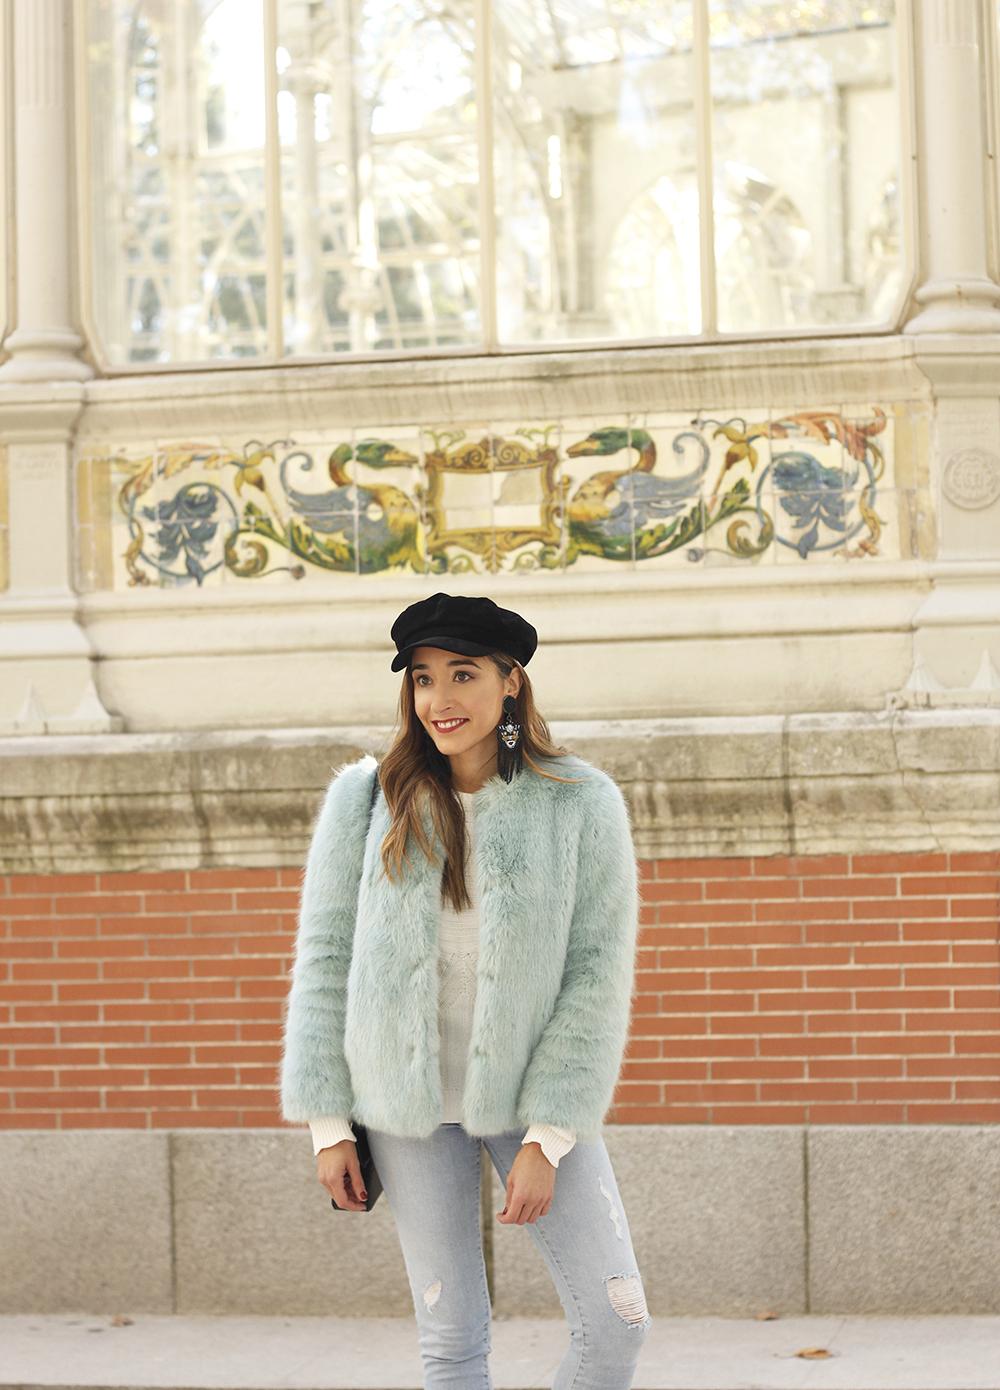 blue light faux fur coat navy cap ripped jeans zara tiger uterqüe earrings outfit street style09